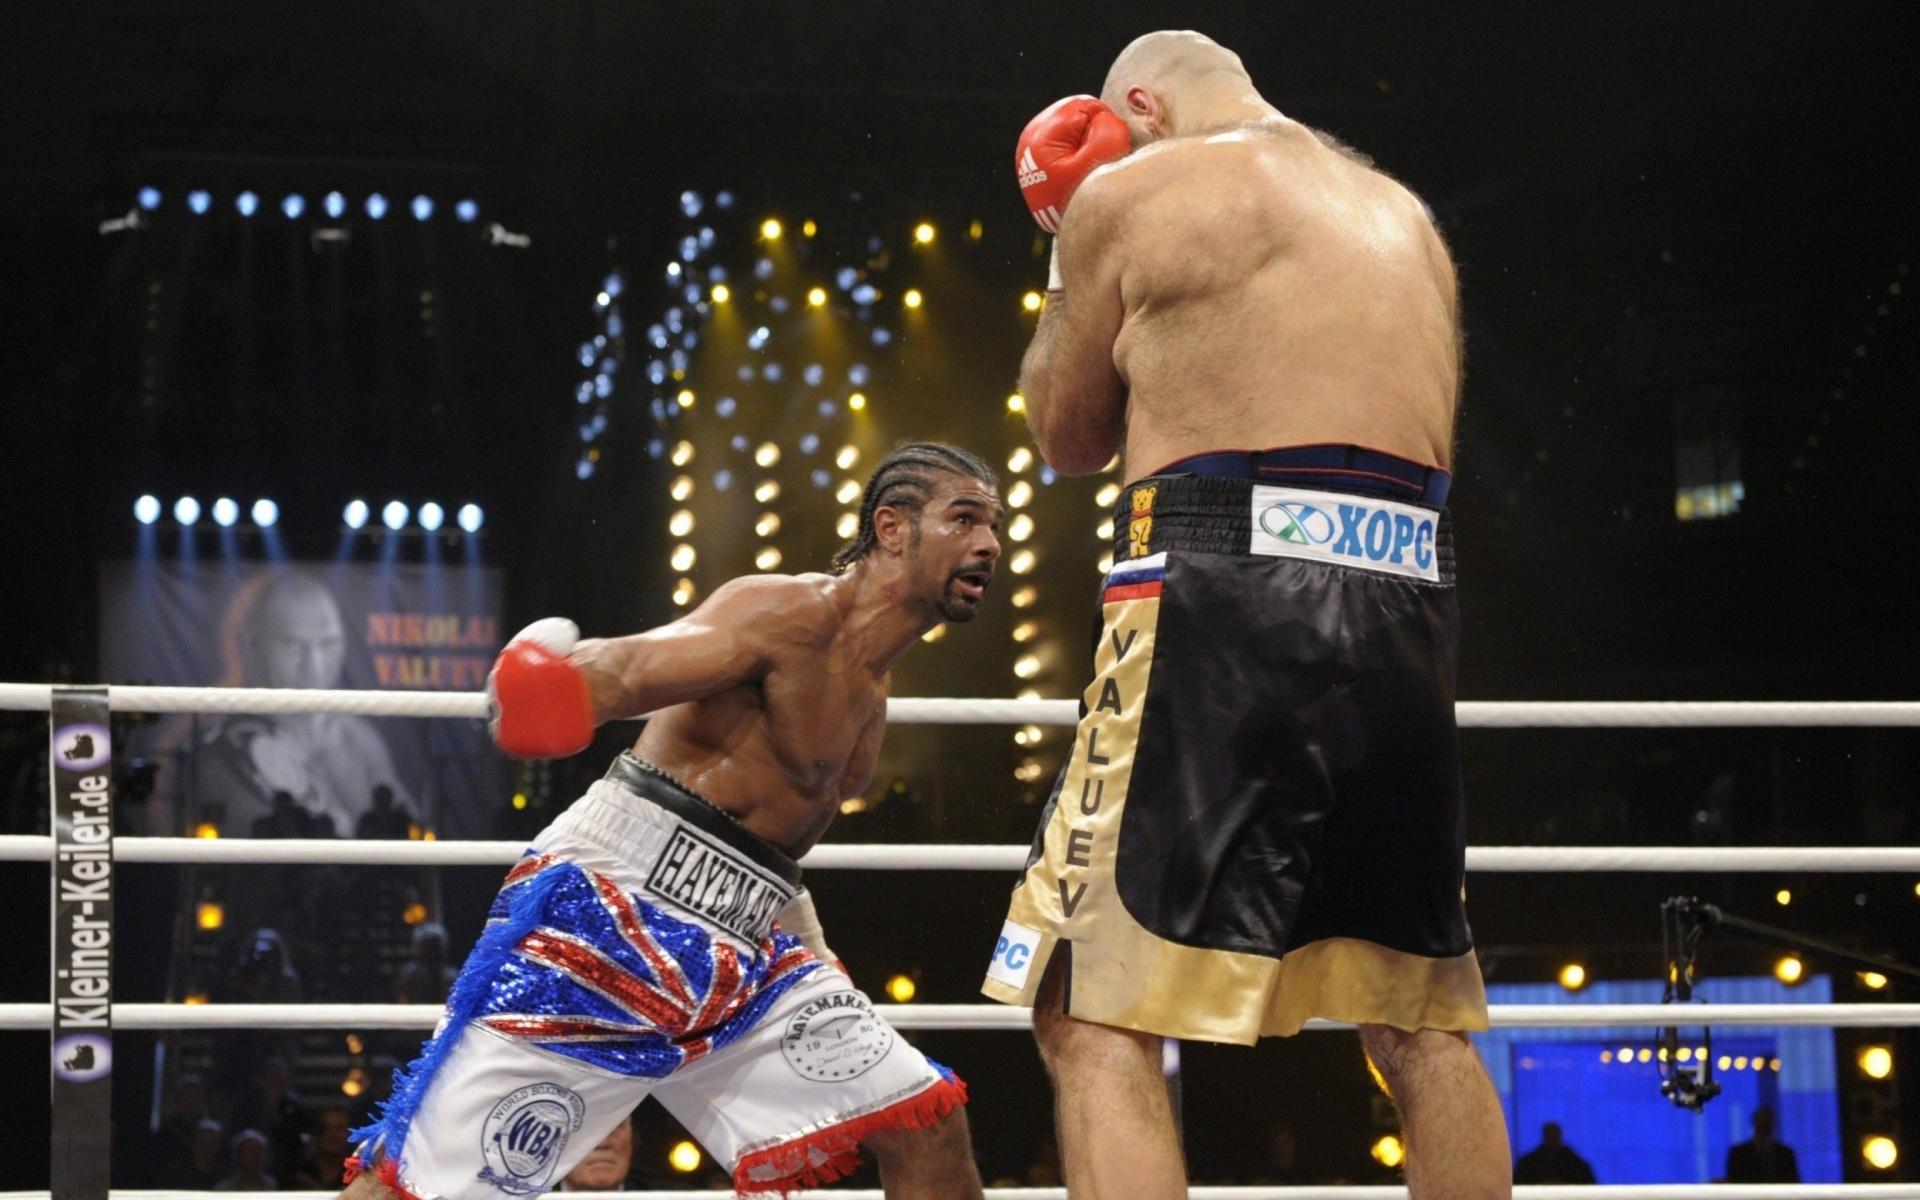 Смешные картинки про бокс